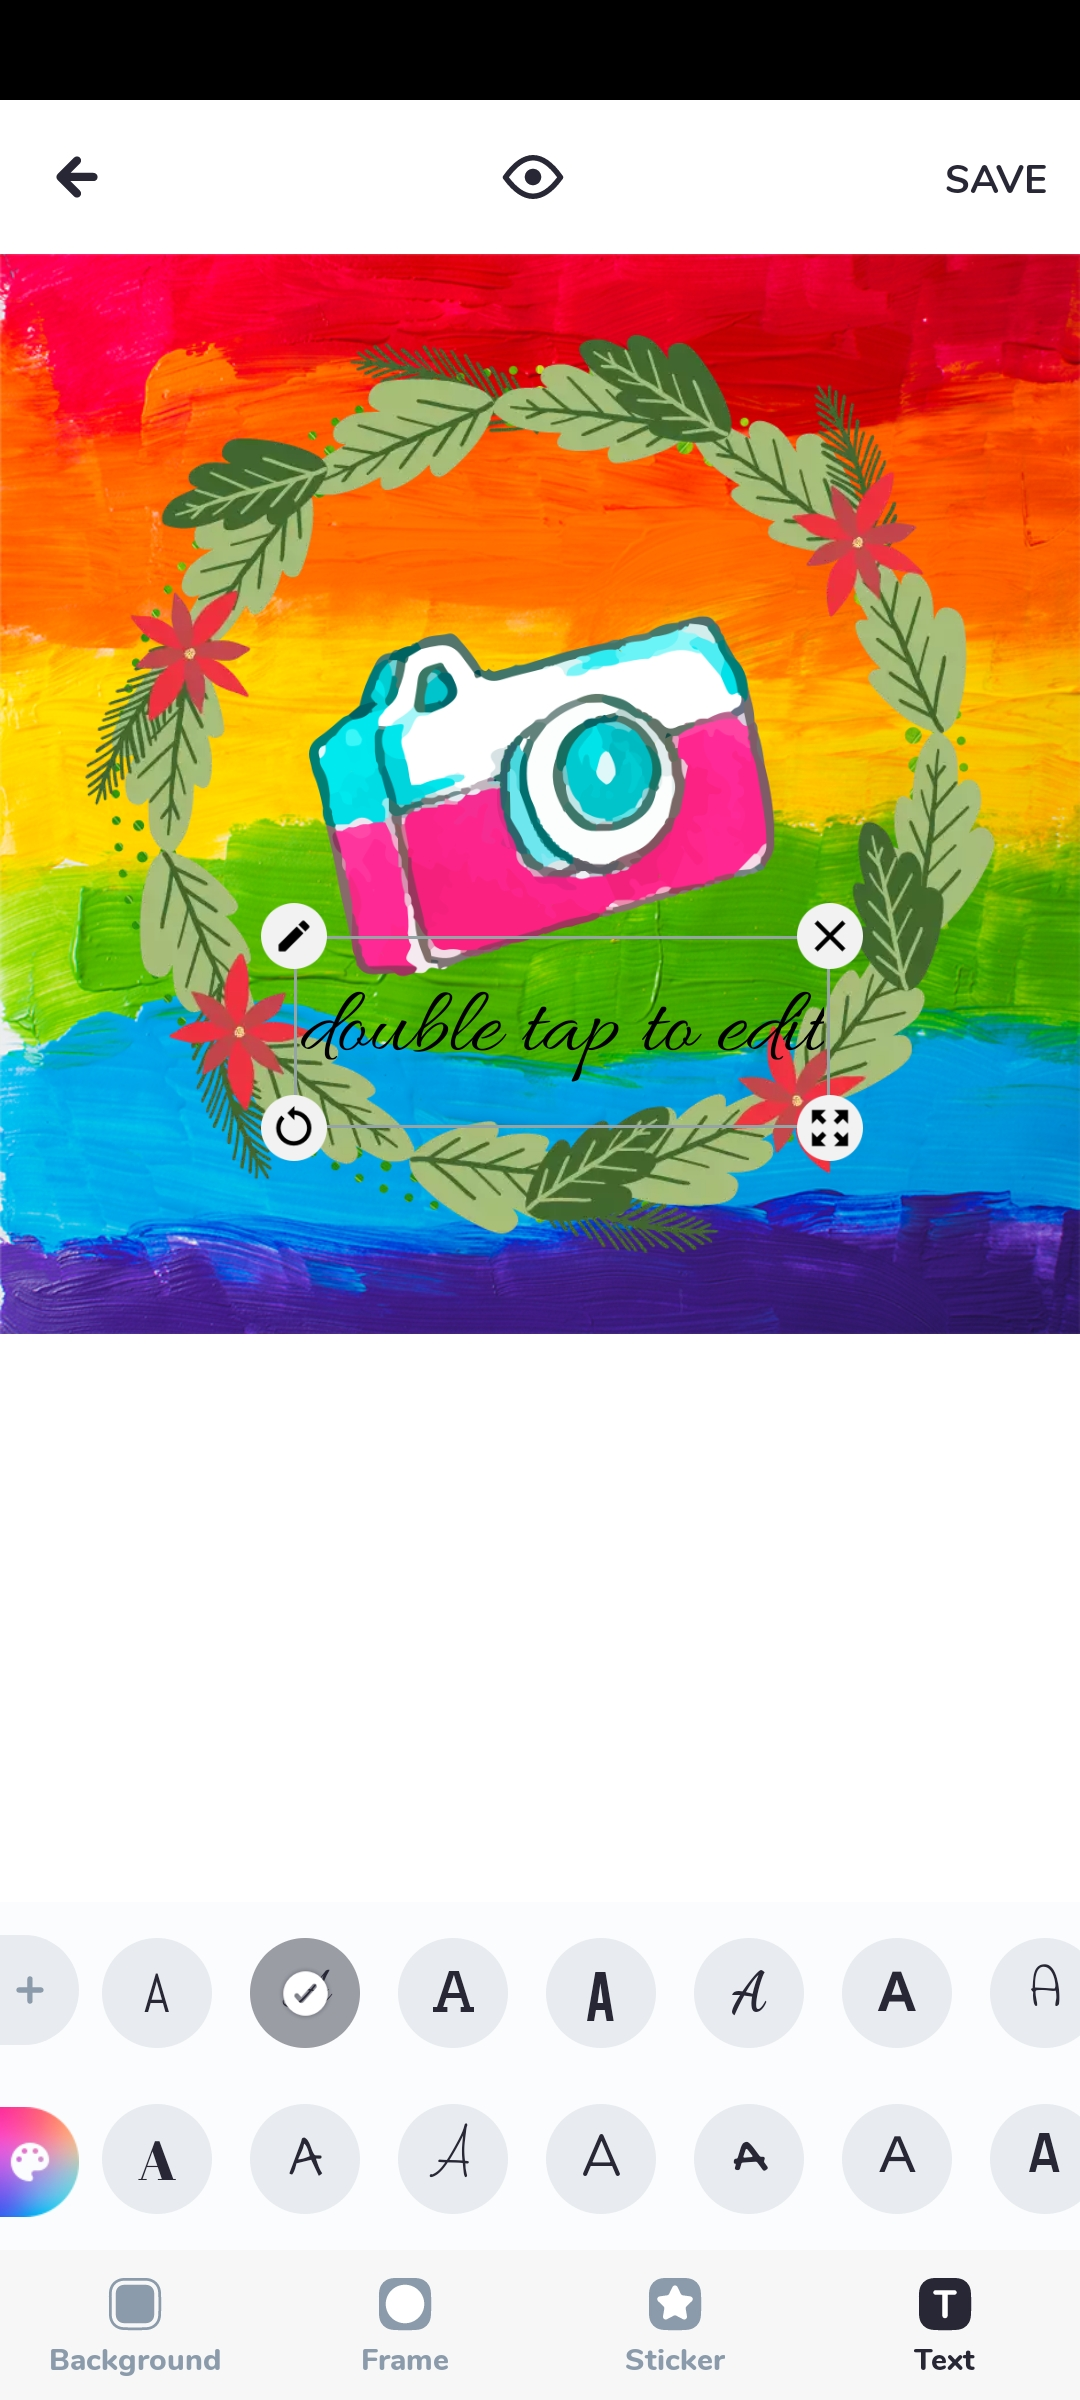 screenshot_2021-02-25-08-08-02-966_com_highlight_cover_maker_for_instagram_story_creator_storylight.jpg